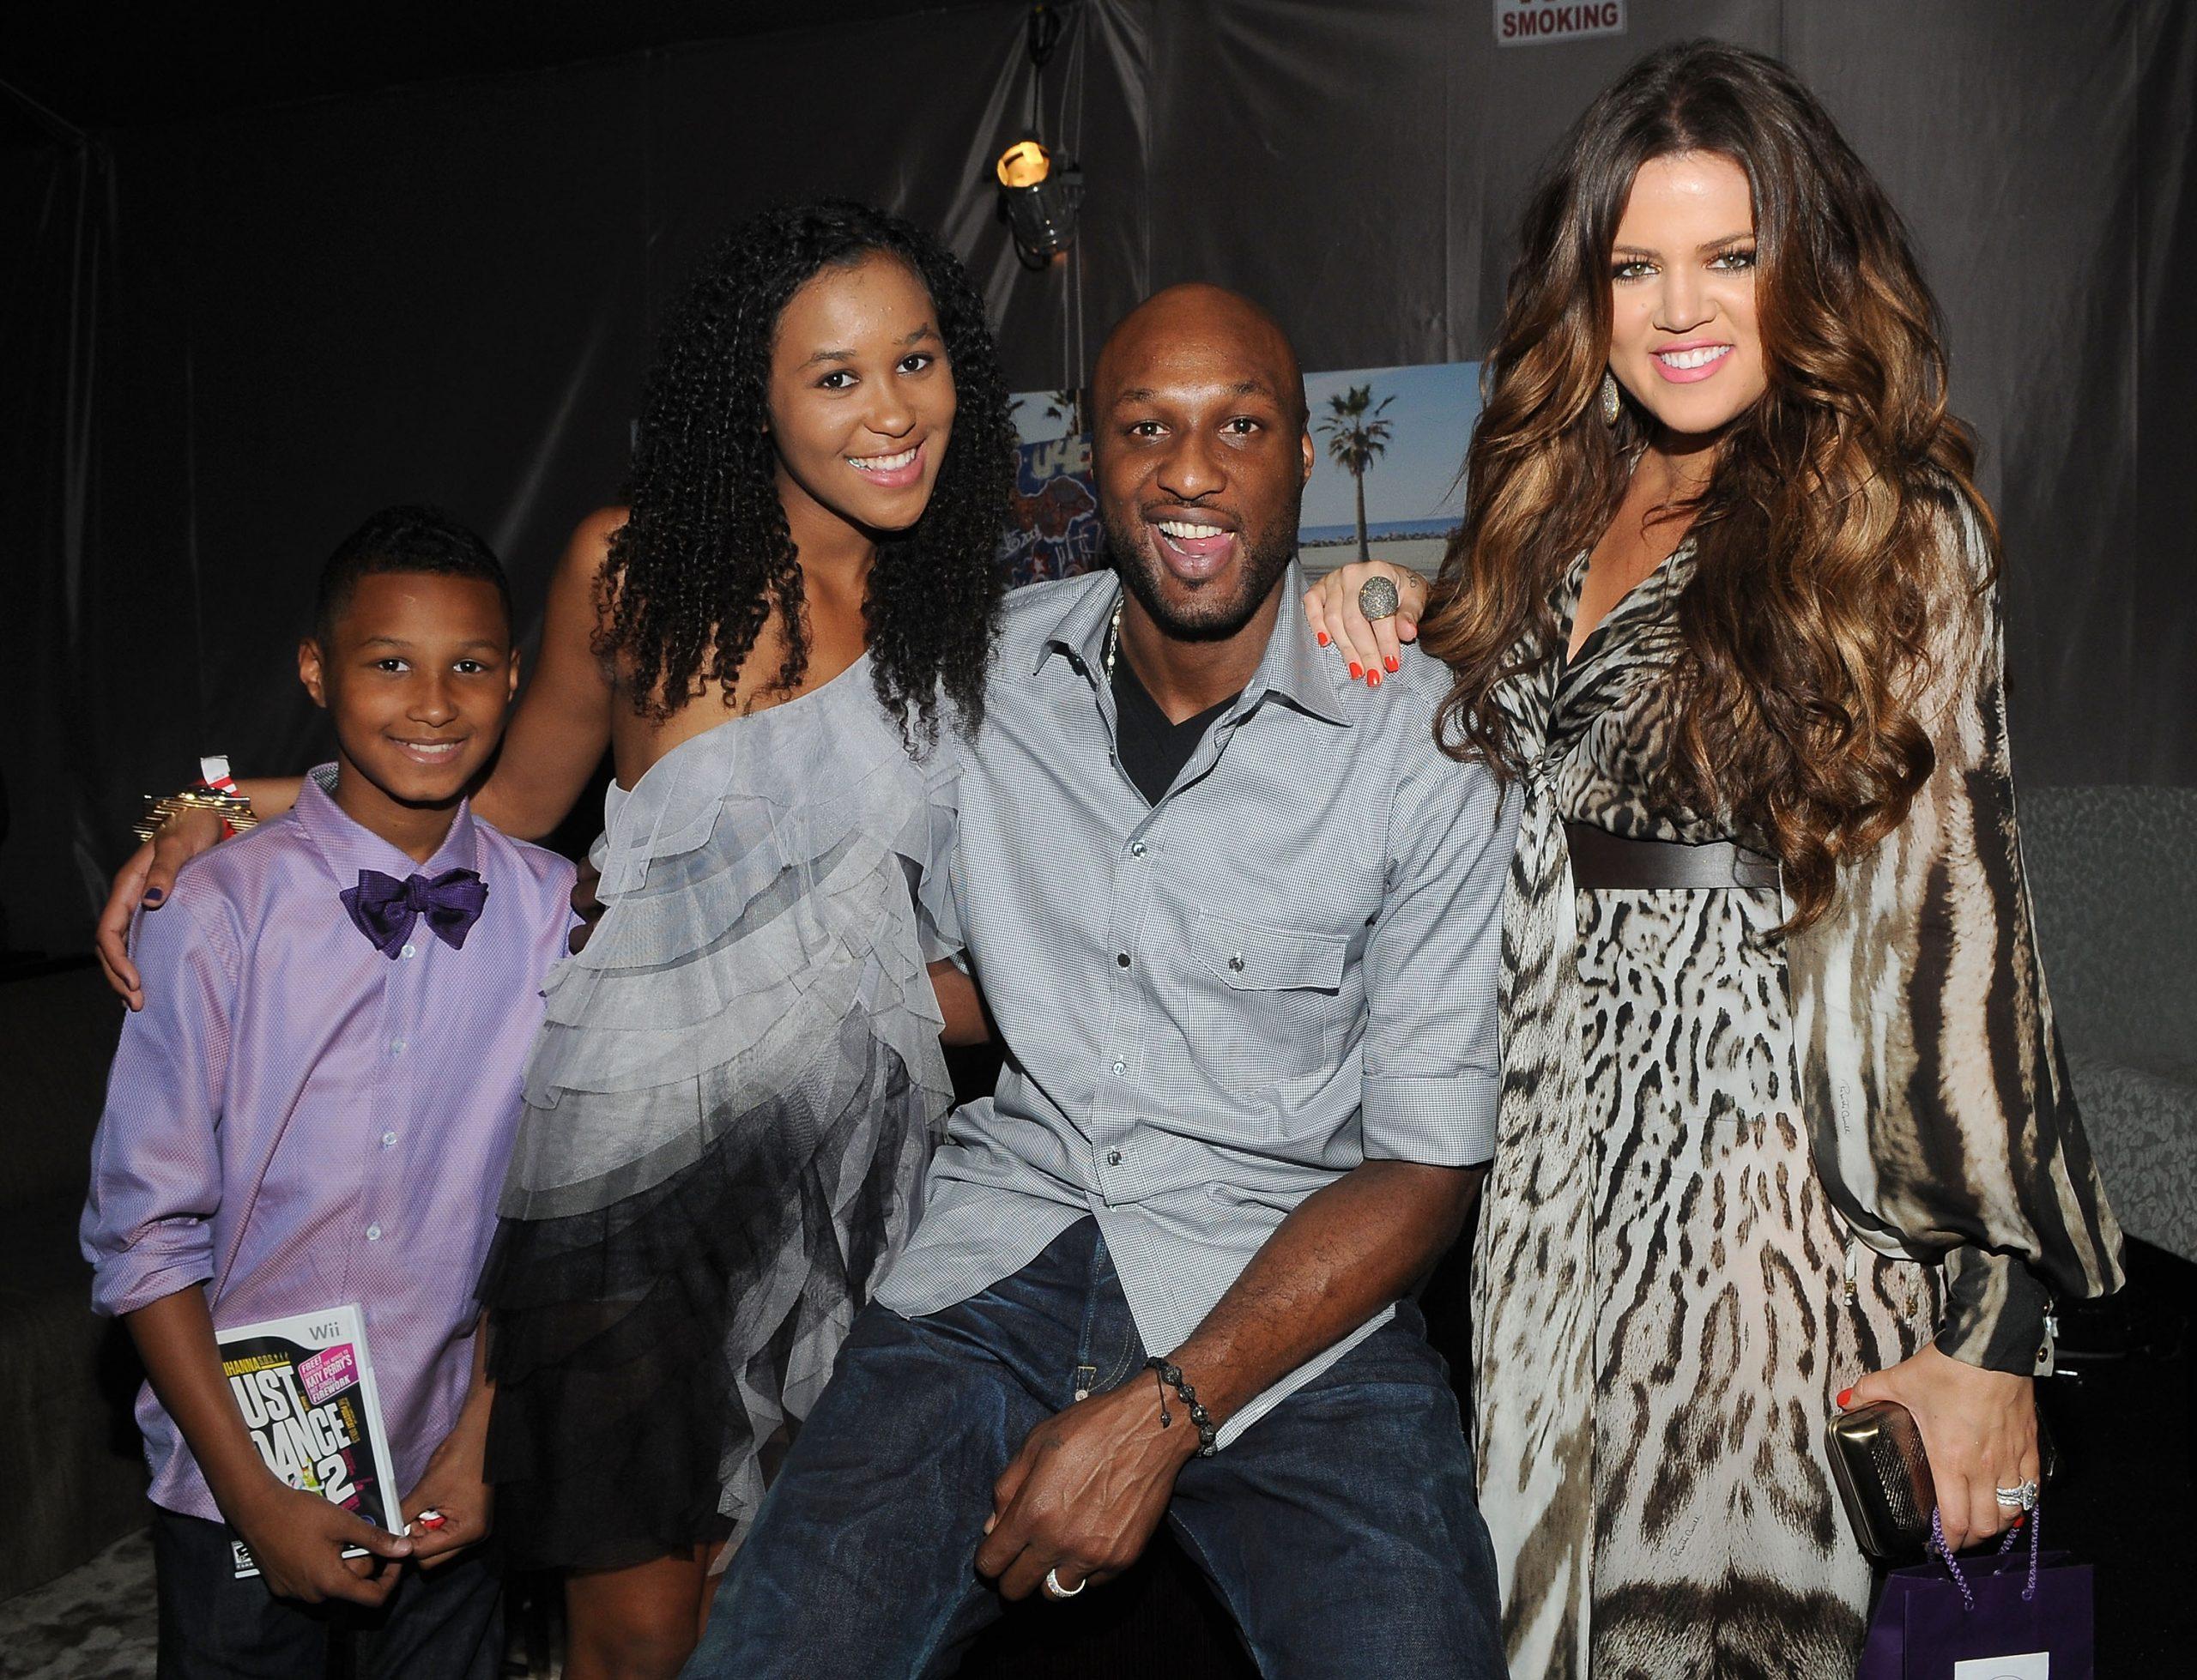 Lamar Odom and Khloé Kardashian smiling with his kids Destiny Odom and Lamar Odom Jr at an awards show.